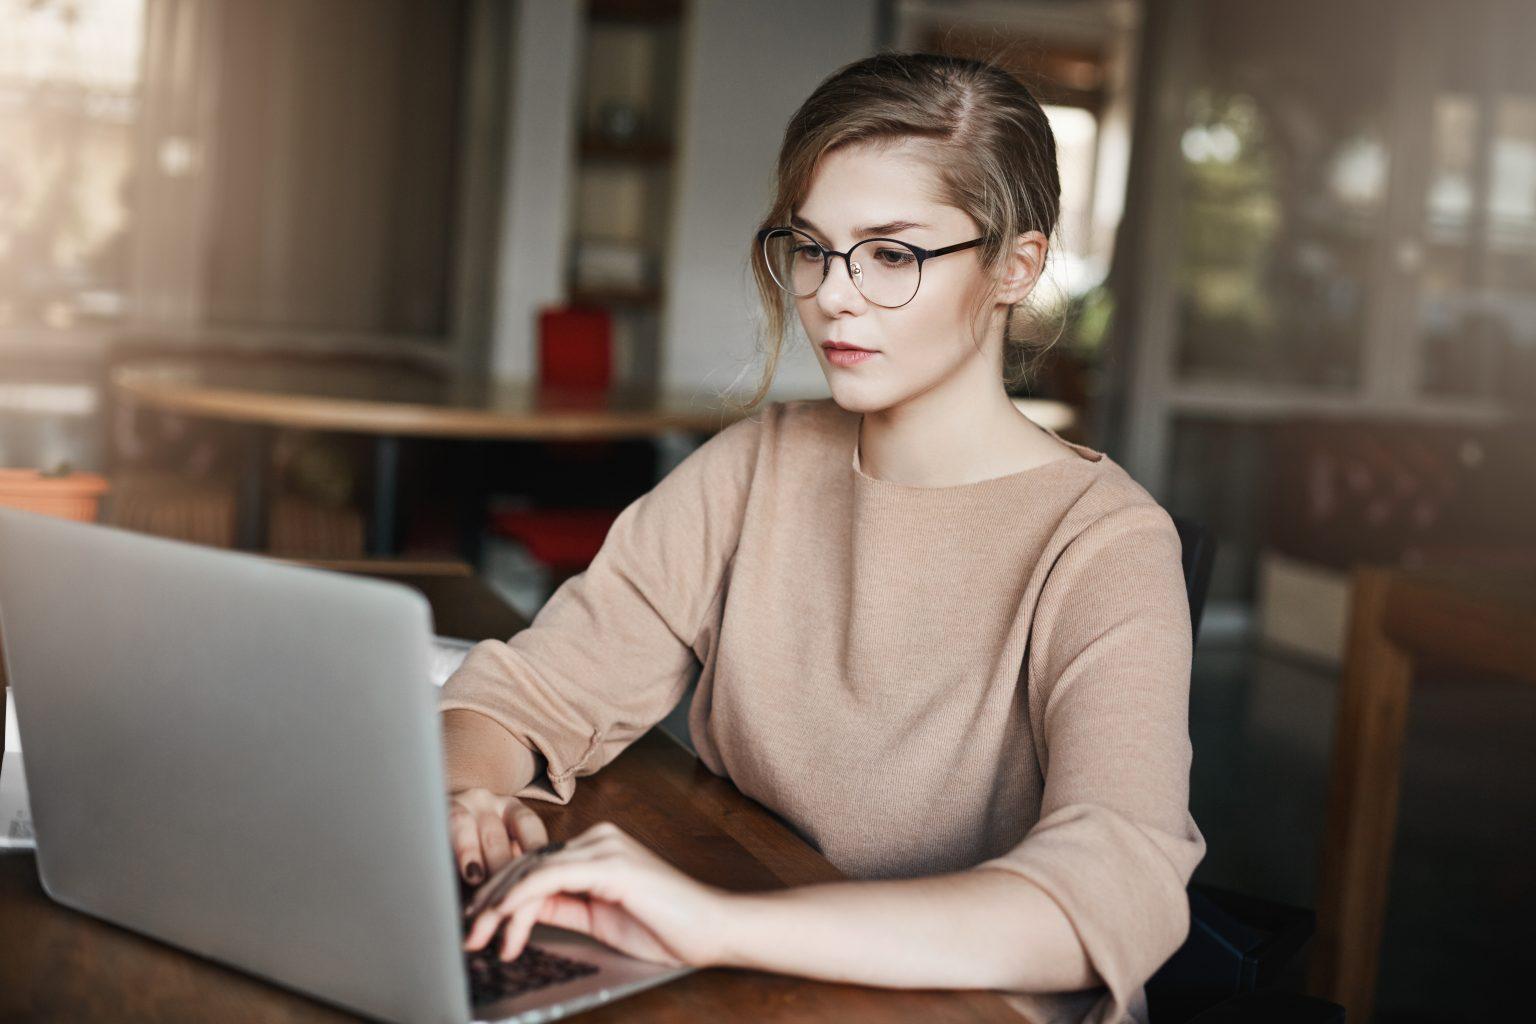 360-Grad-Feedback Frau arbeitet mit Laptop